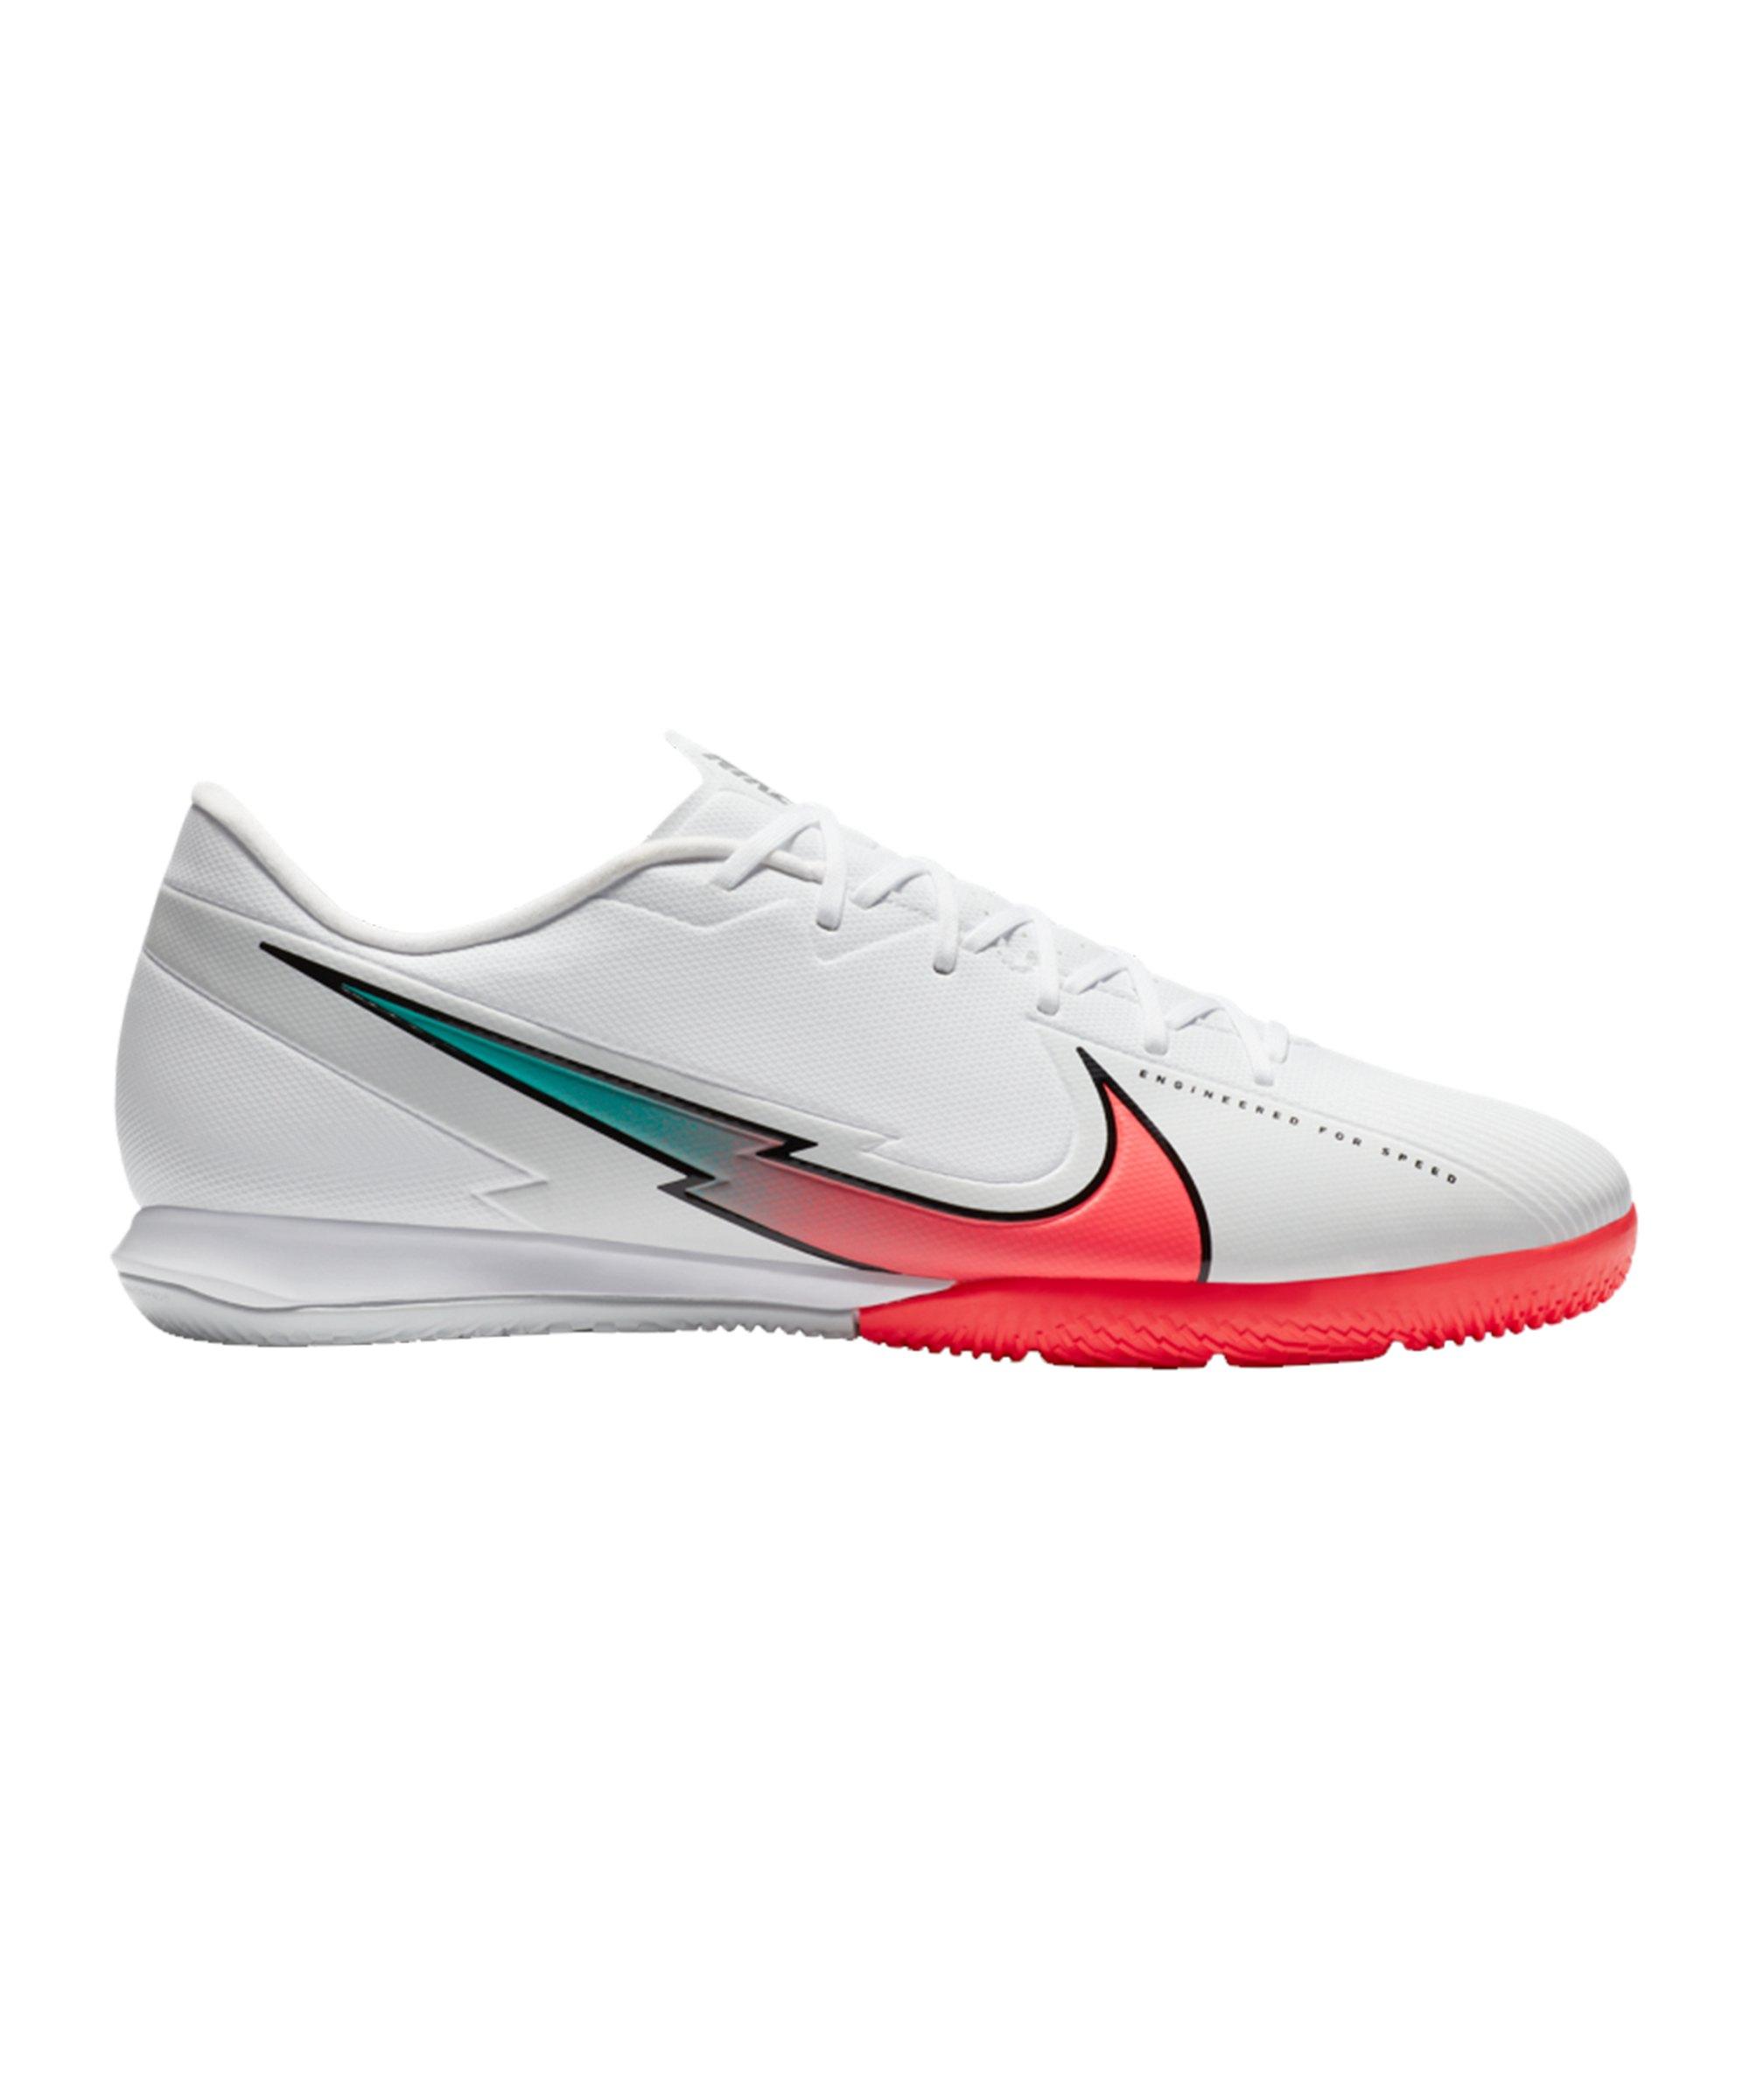 Nike Mercurial Vapor XIII Flash Crimson Academy IC Weiss F163 - weiss